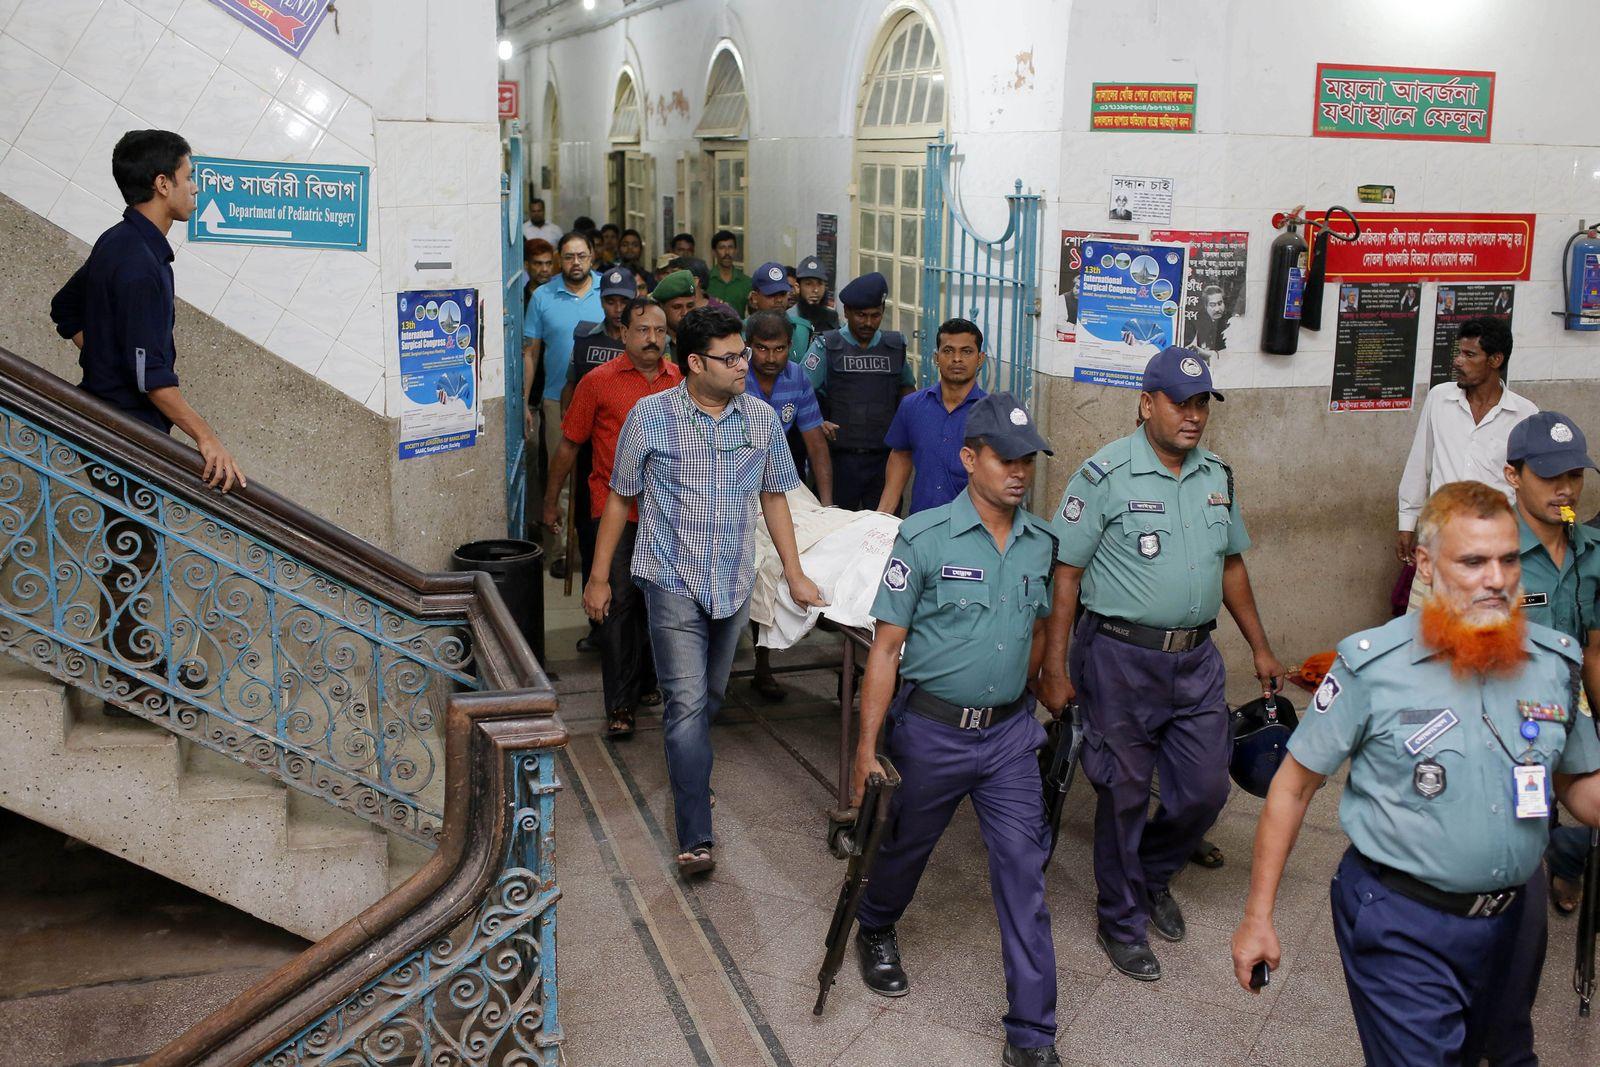 Bangladesch: Verleger Faisal Arefin ermordet